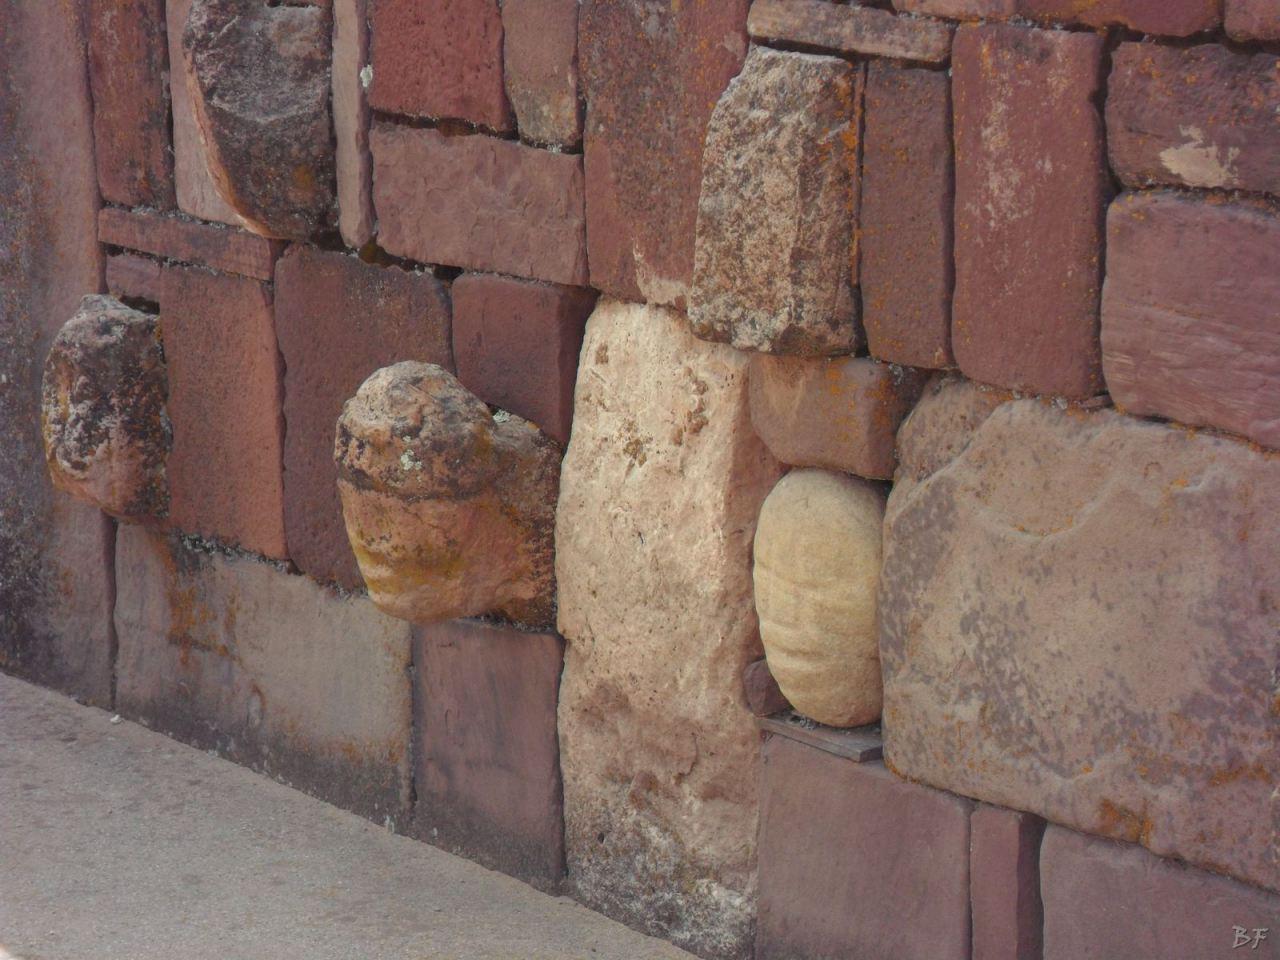 Sito-Megalitico-Piramide-Akapana-Kalasasaya-Menhir-Tiahuanaco-Bolivia-96